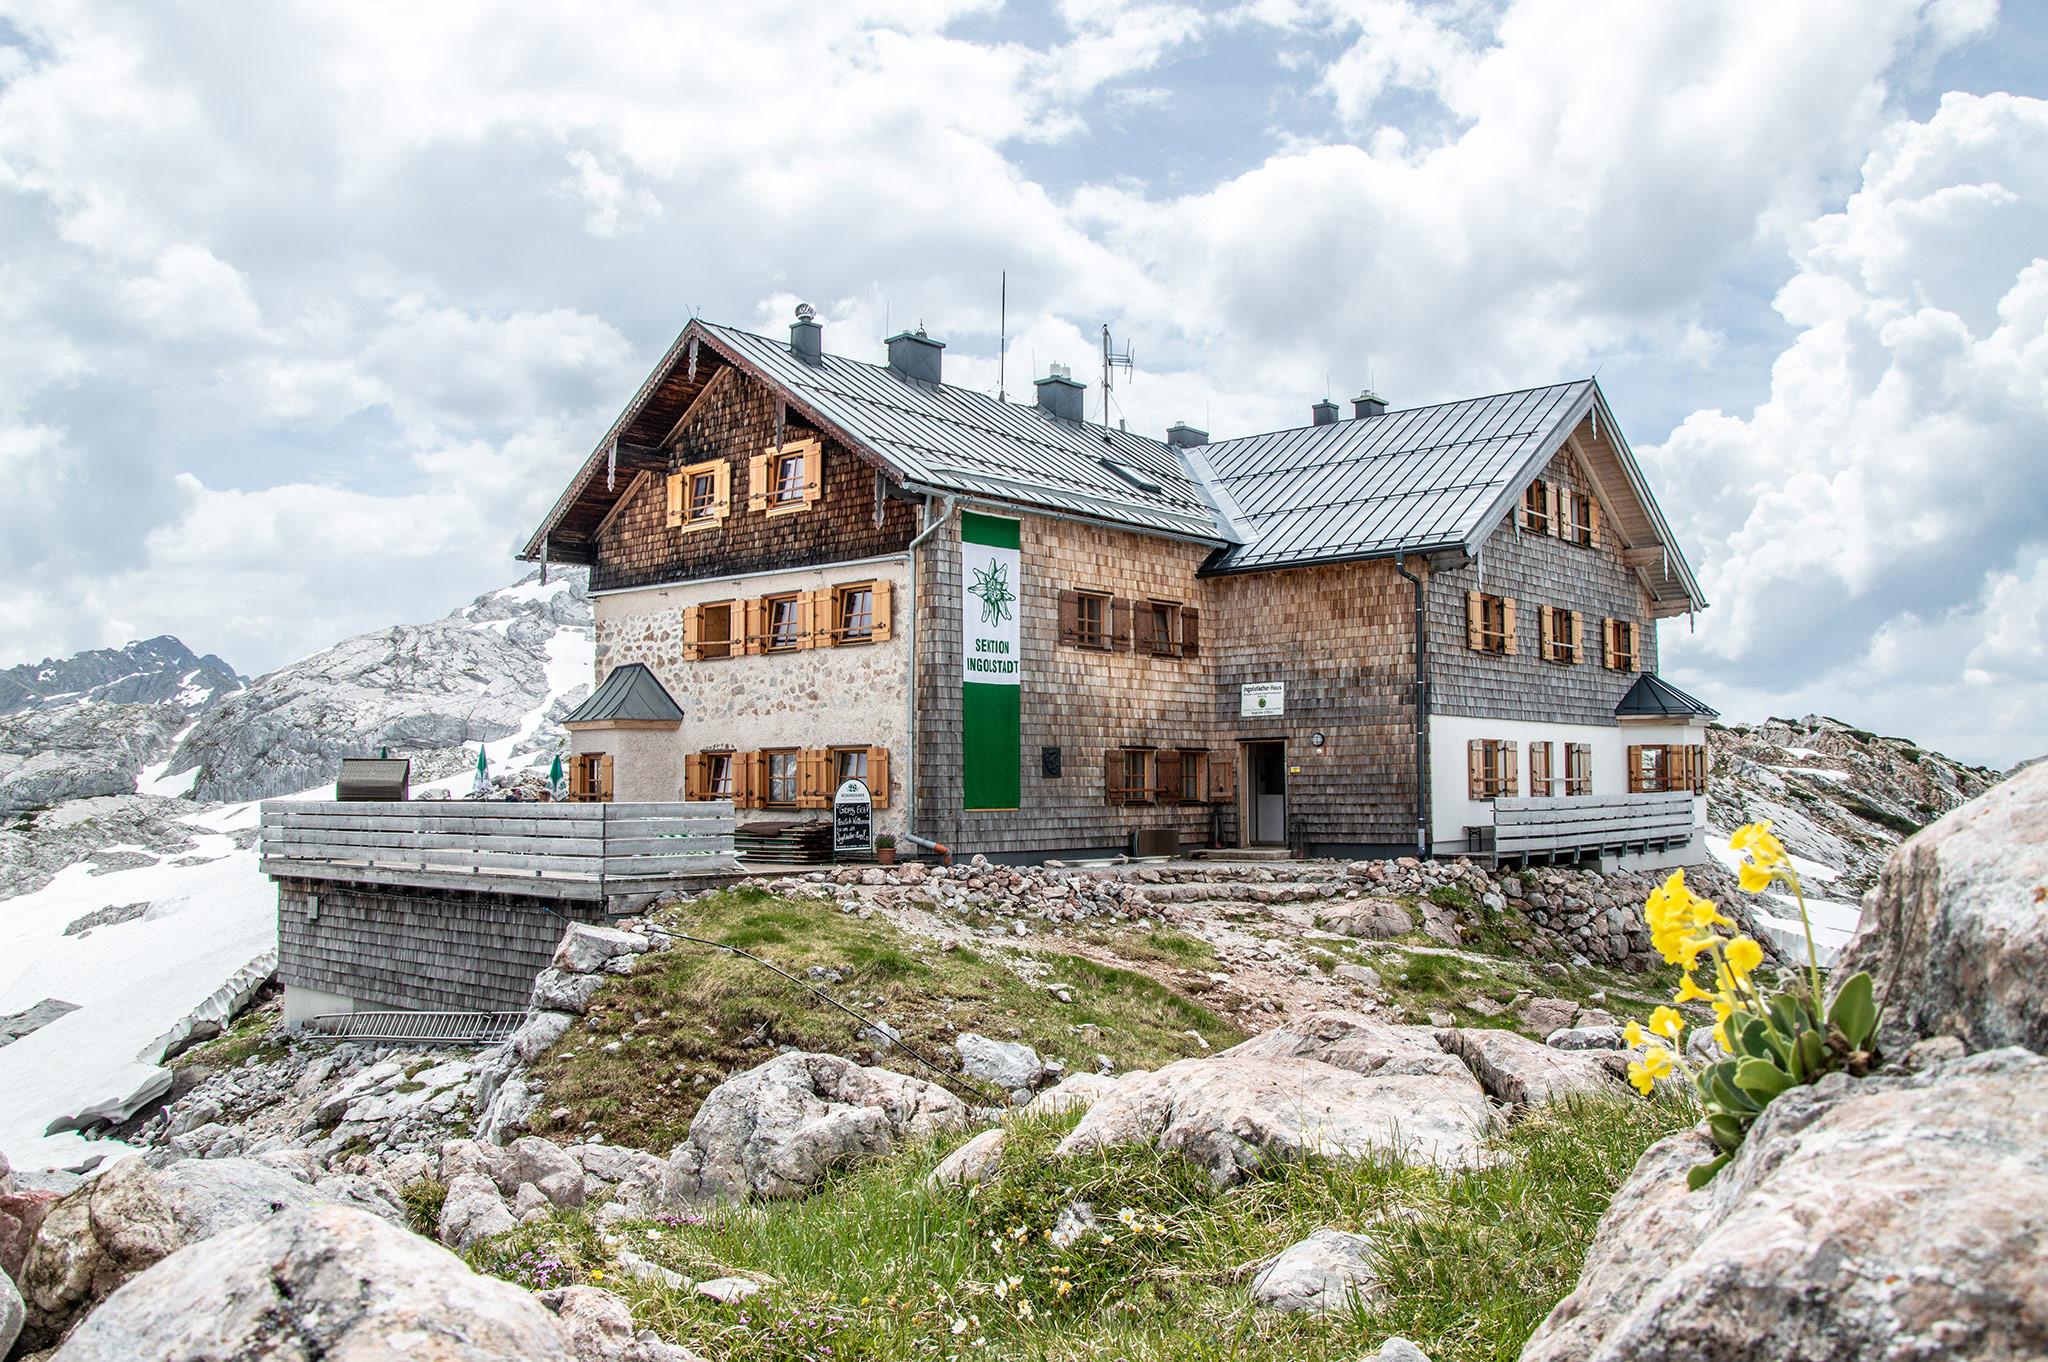 Ingolstädter Haus  Ingolstädter Haus Frühling Bergerlebnis & Alpenstadt Blog